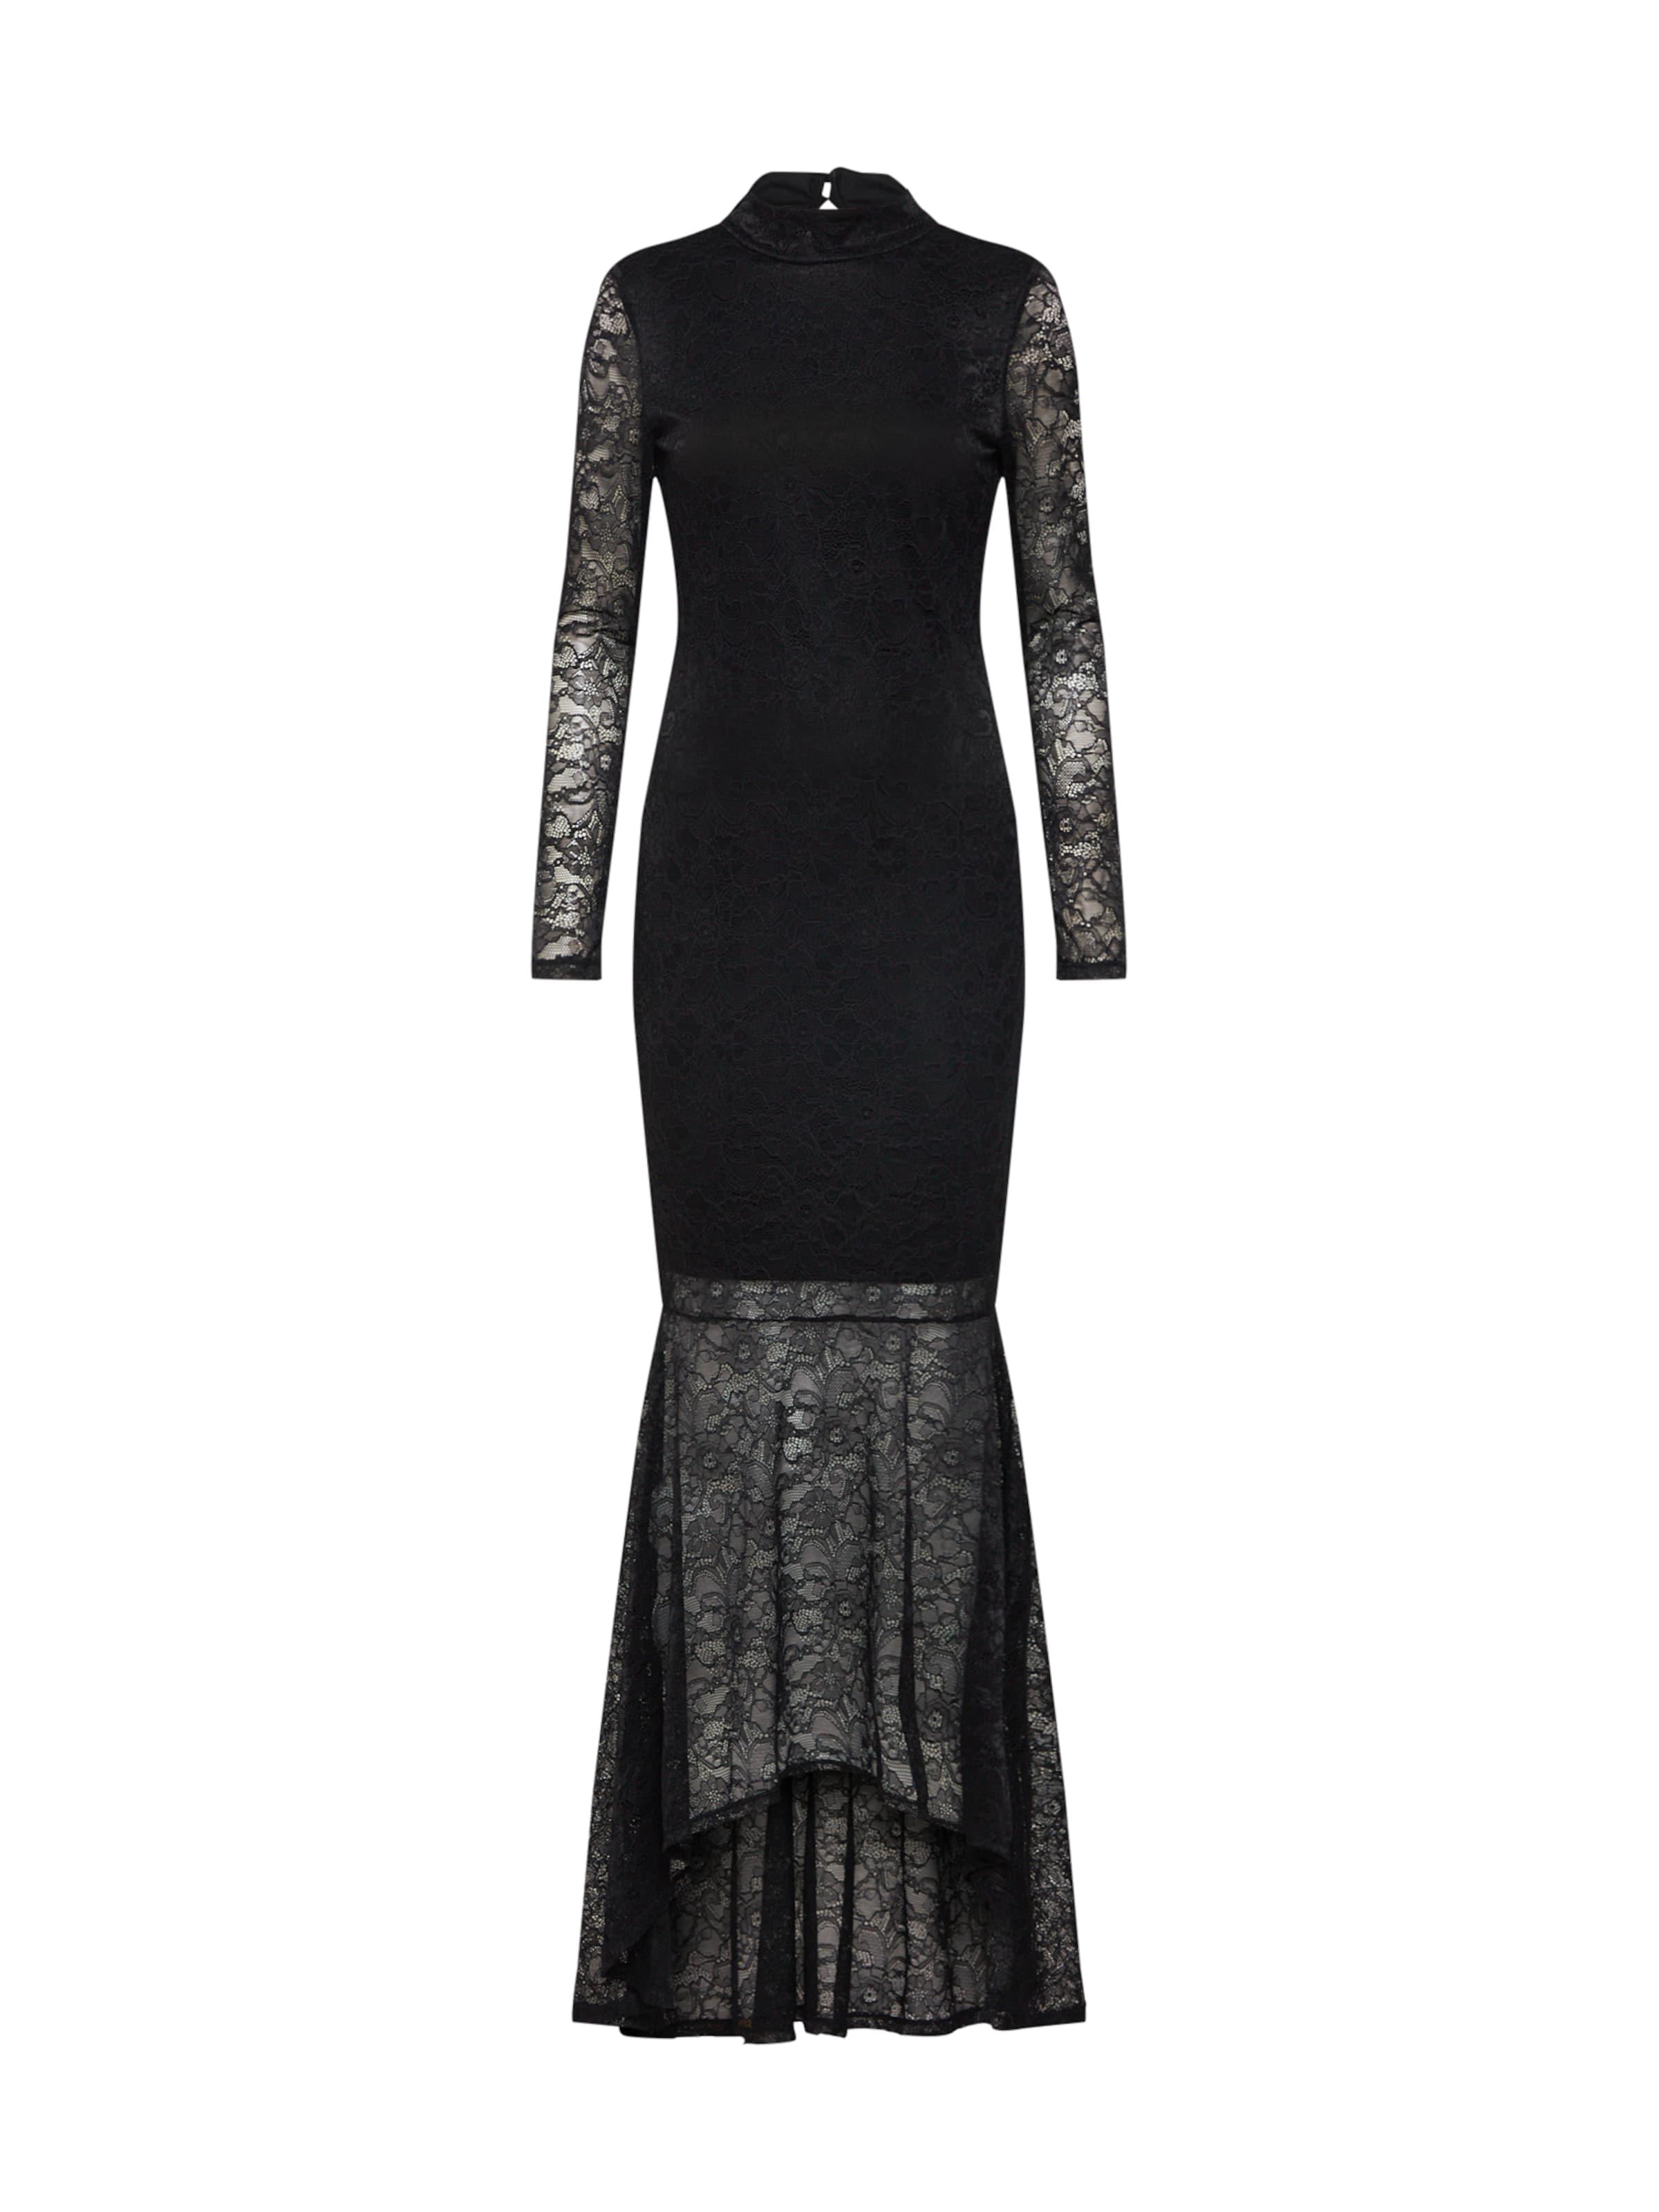 Soirée Robe Noir En De Vila 'virigmor' Yfg76ybIv